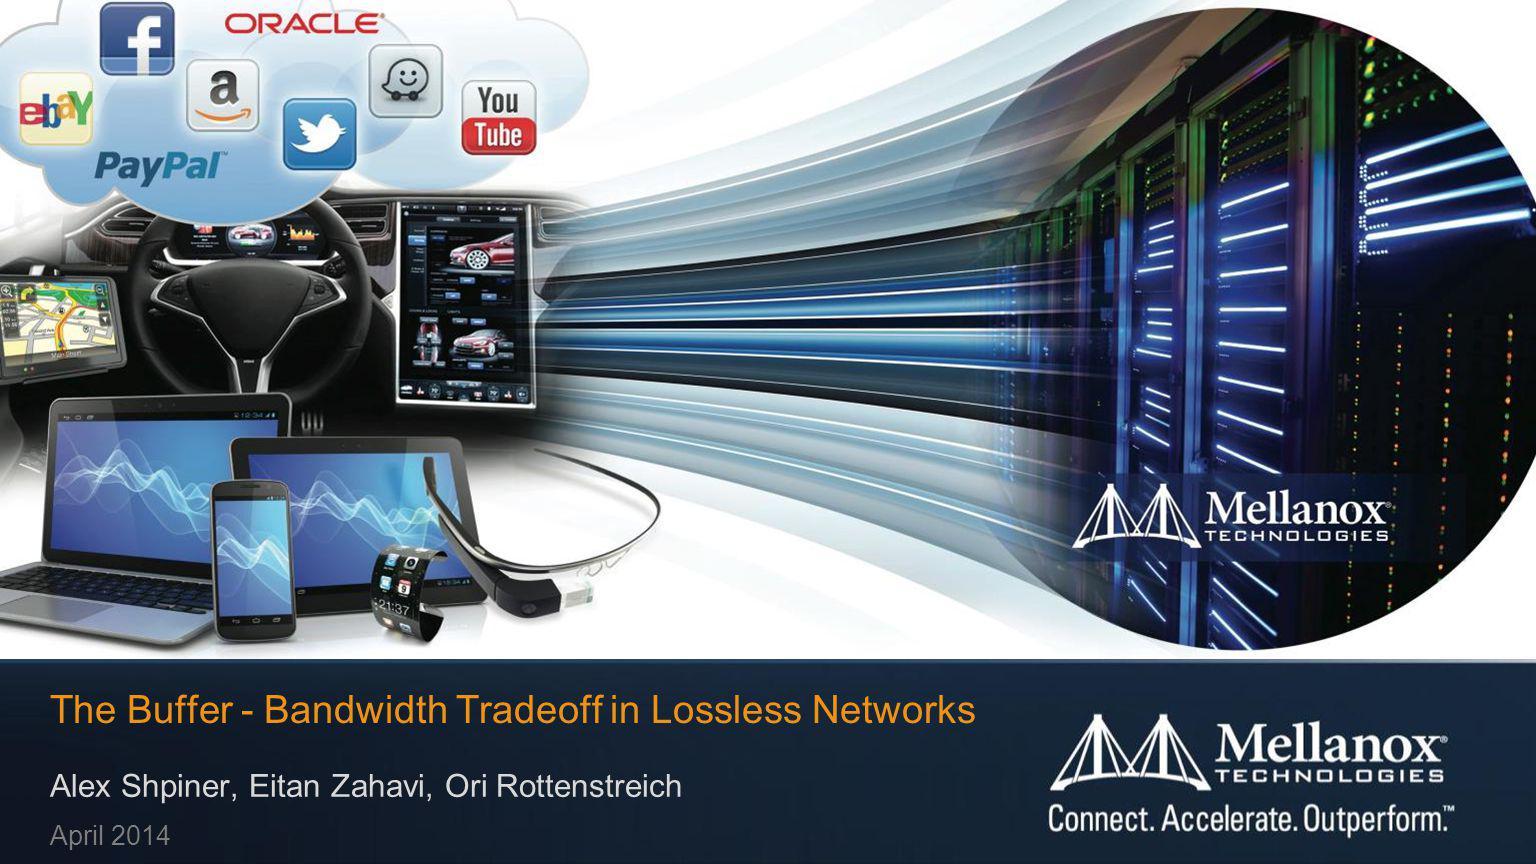 © 2014 Mellanox Technologies 2 - Mellanox Technologies- Background: Network Incast Congestion Source: http://theithollow.com/2013/05/flow-control-explained/ 100% 300%